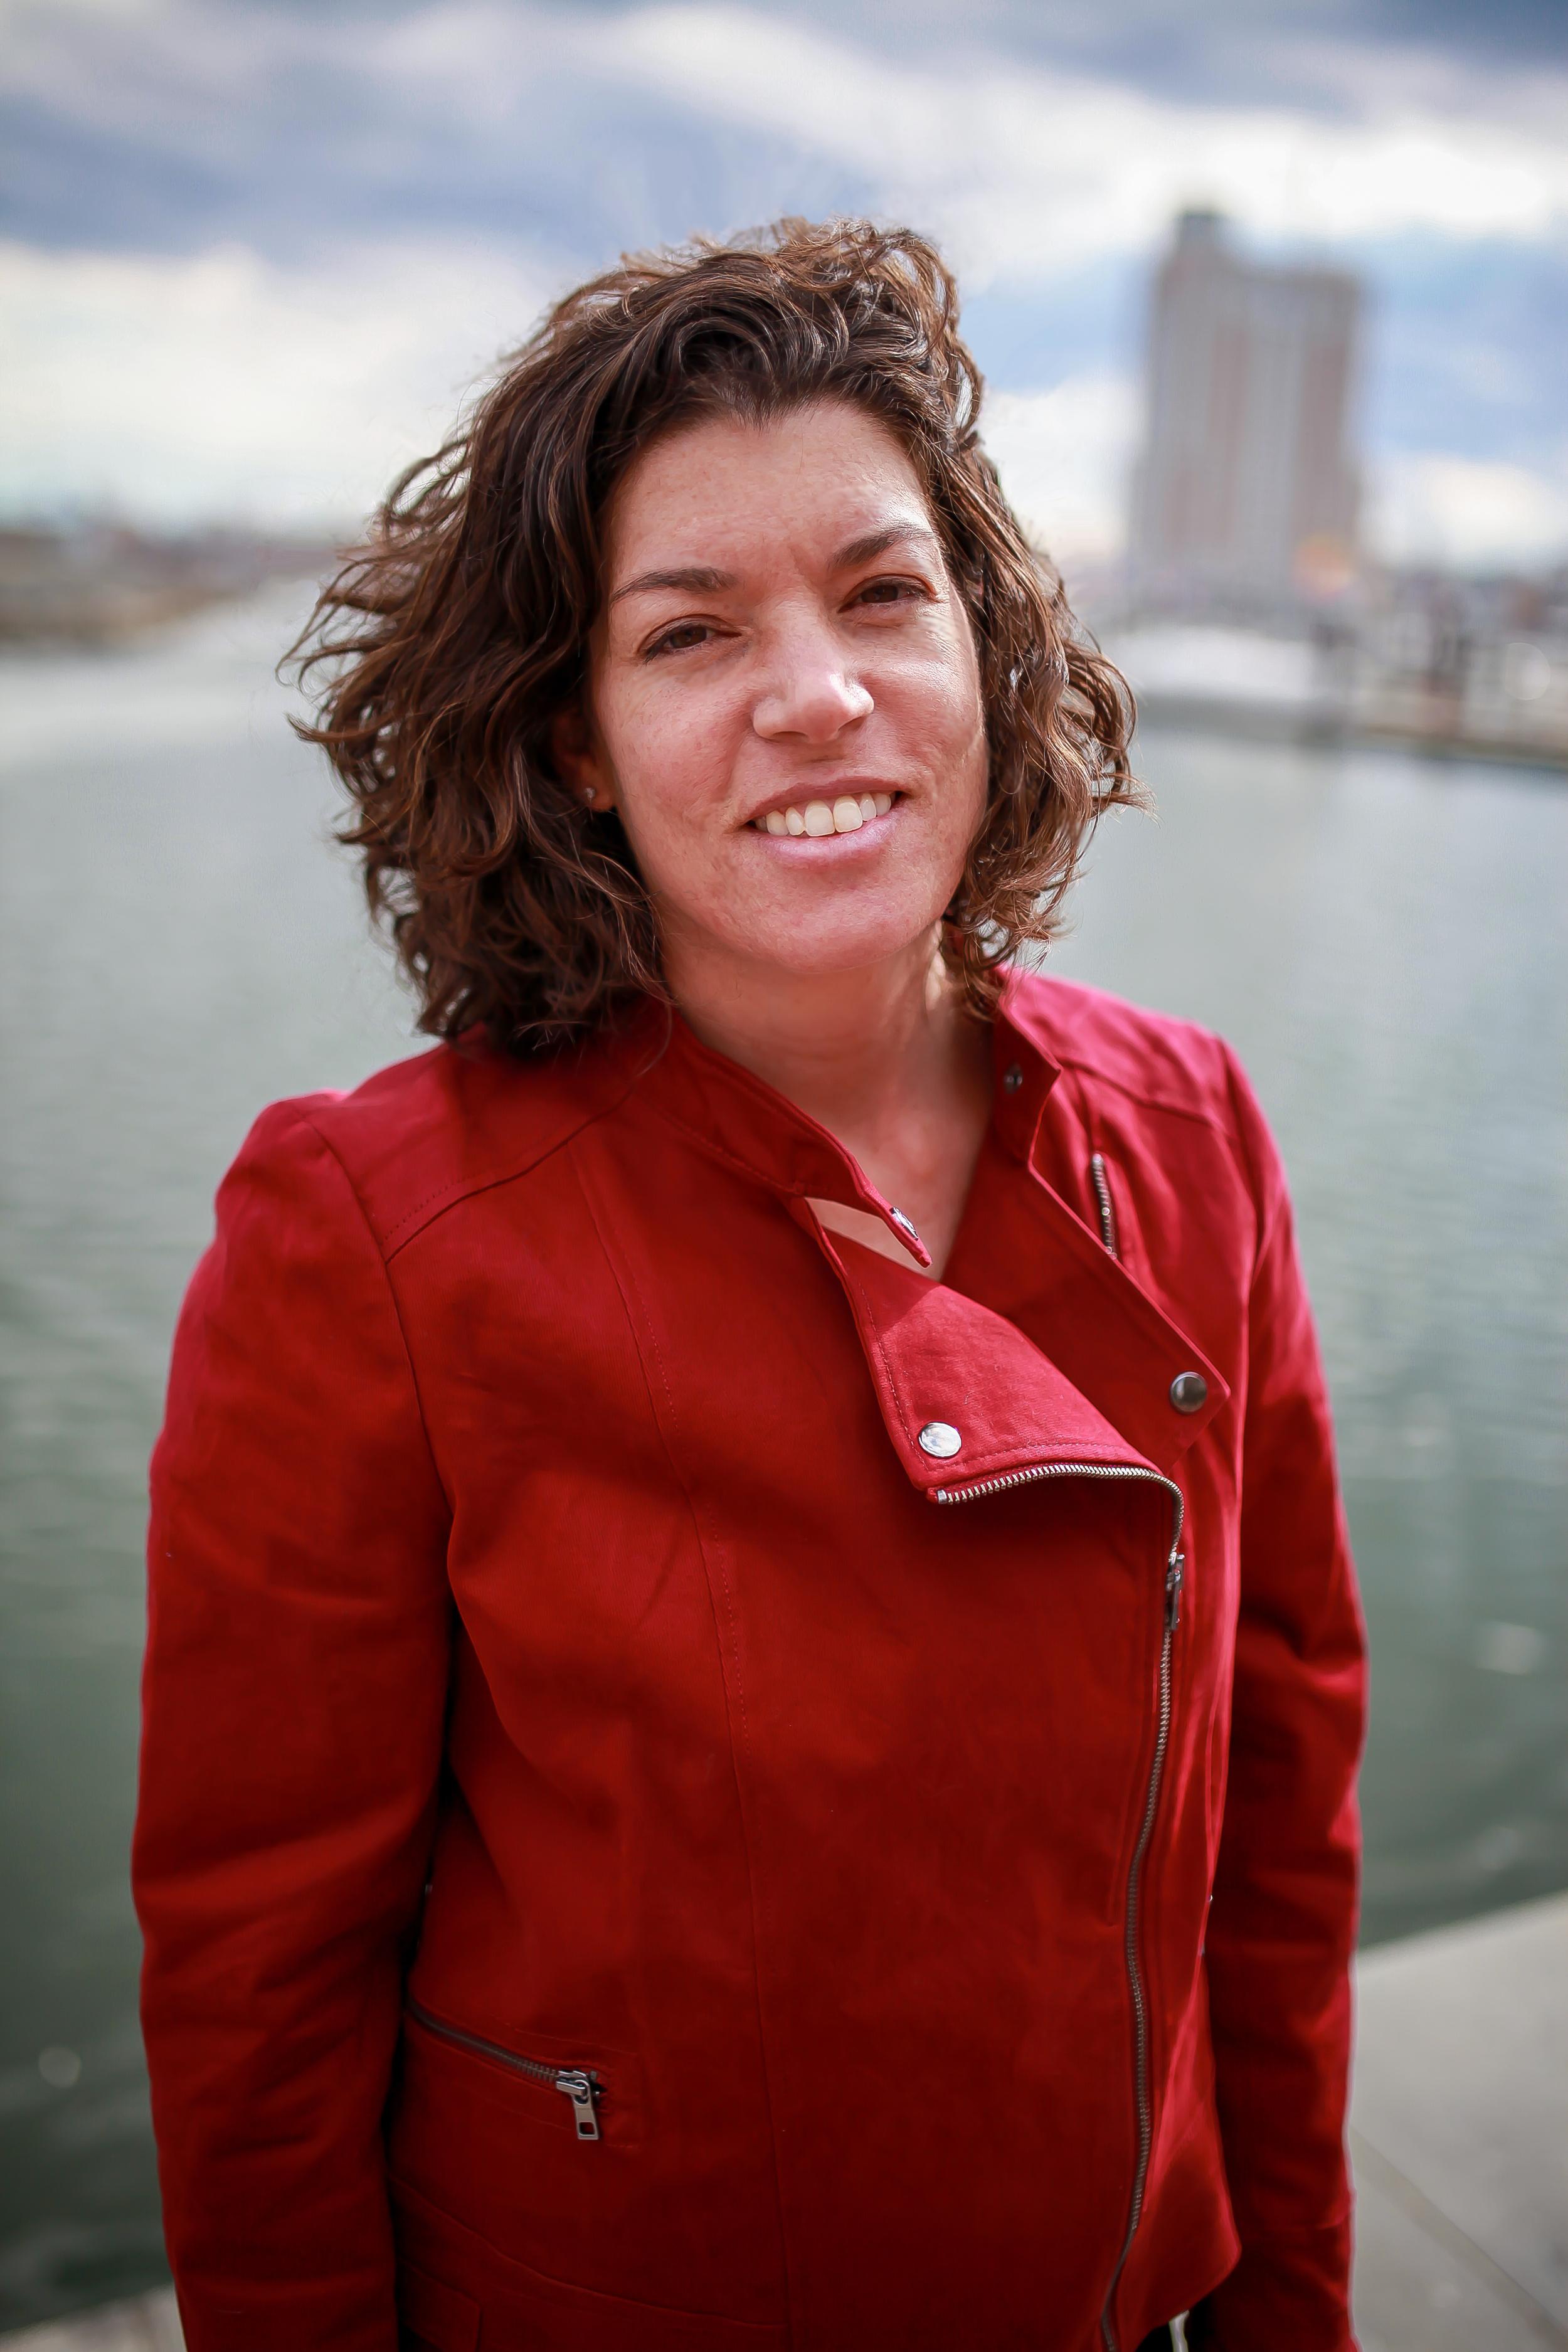 Sarah McIver